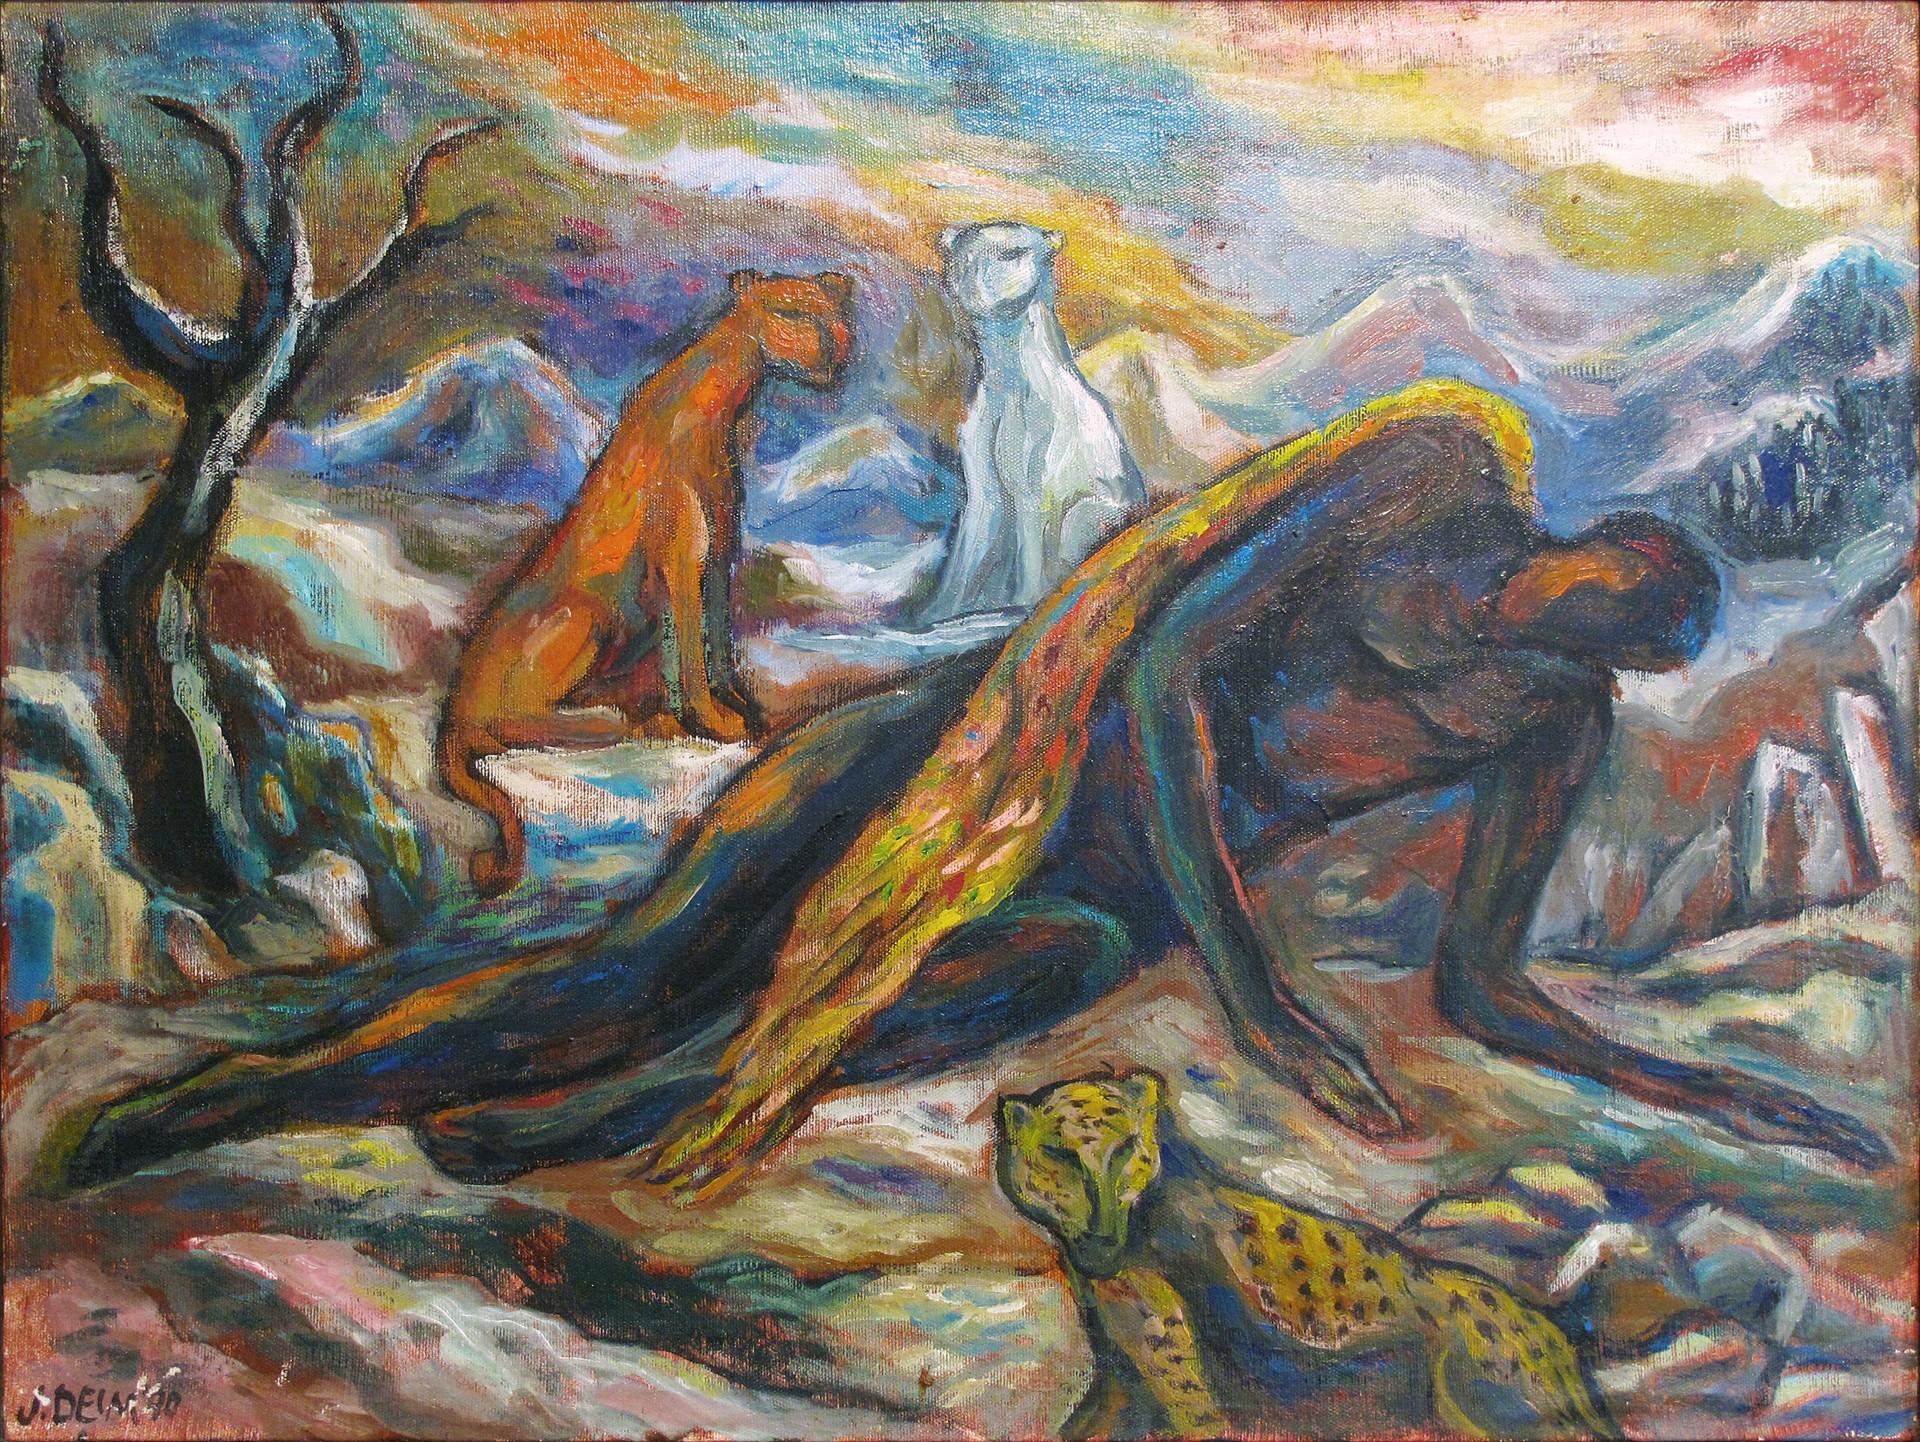 Angel Cayendo (Fallen Angel) by Judith Deim